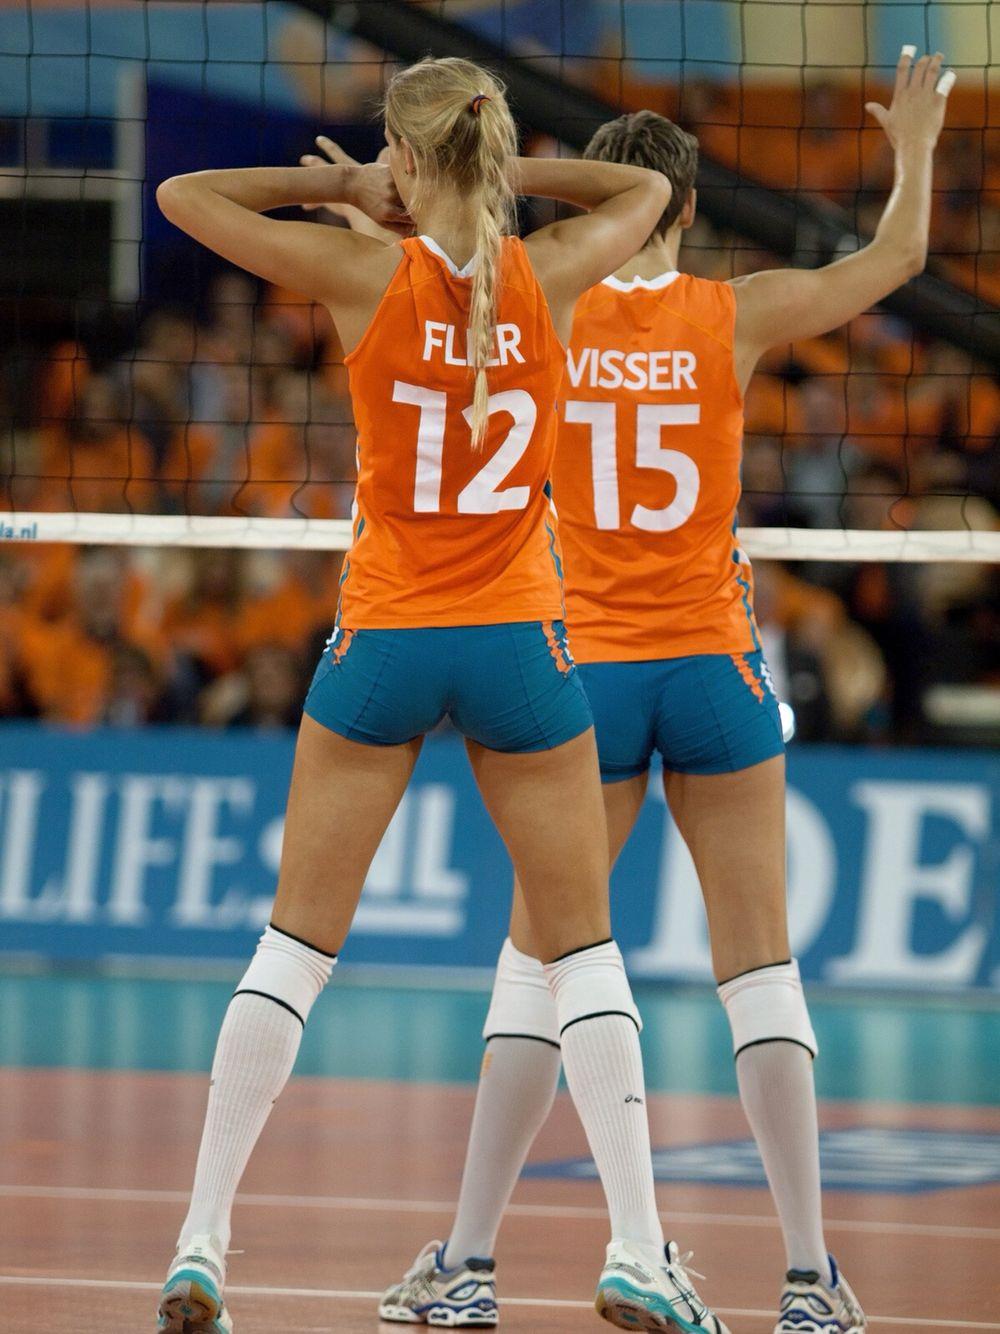 Pin Van Sarissa Ketharang Op Volleyballspelers Volleybal Sport Fotografie